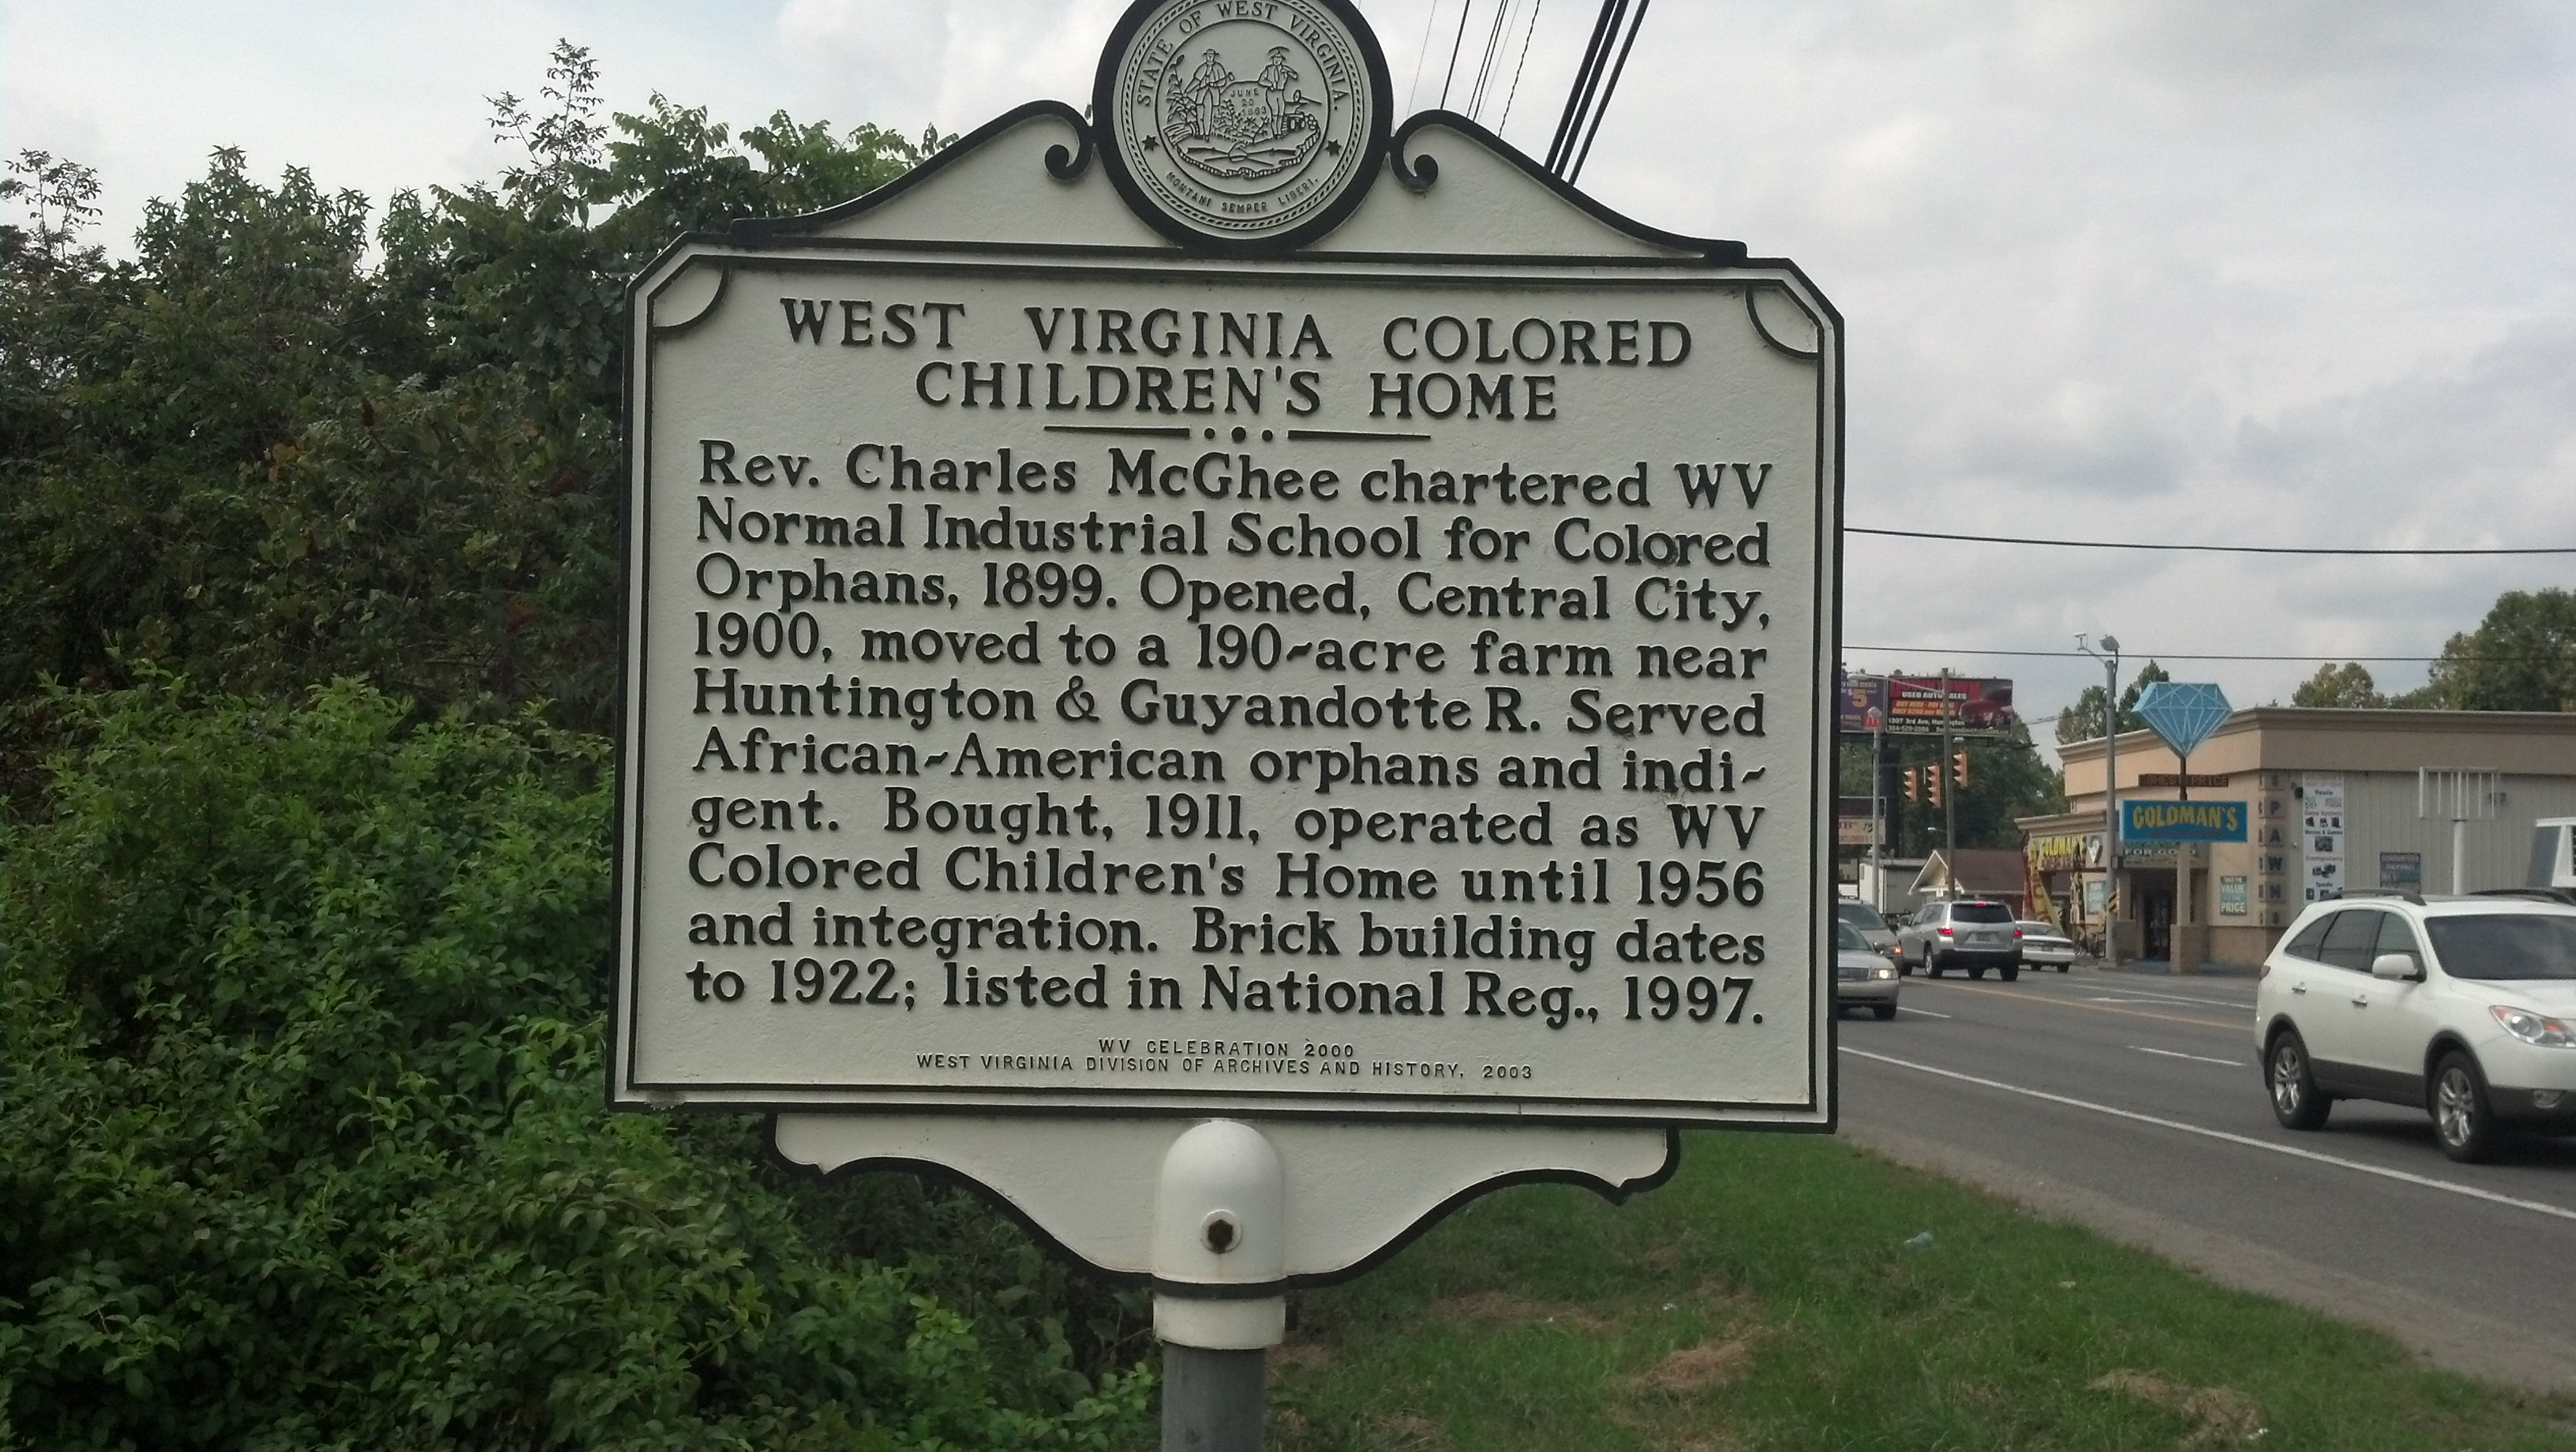 W.V. Colored Children's Home Historic Marker